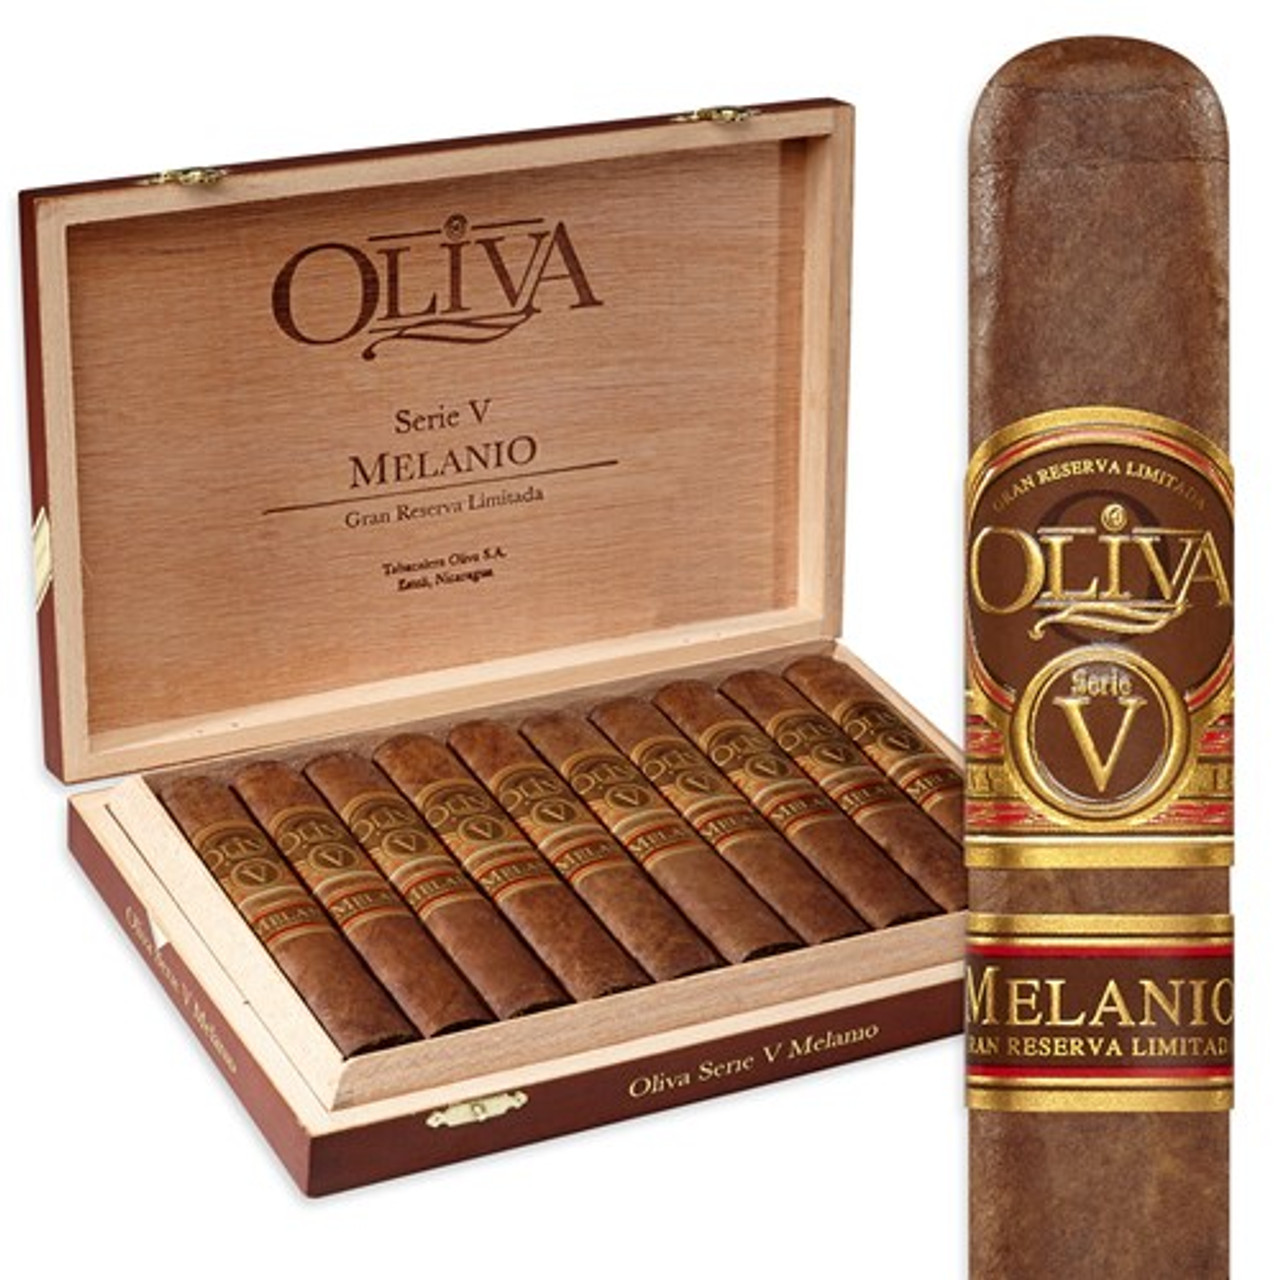 Oliva Serie V Melanio No. 4 Petit Corona